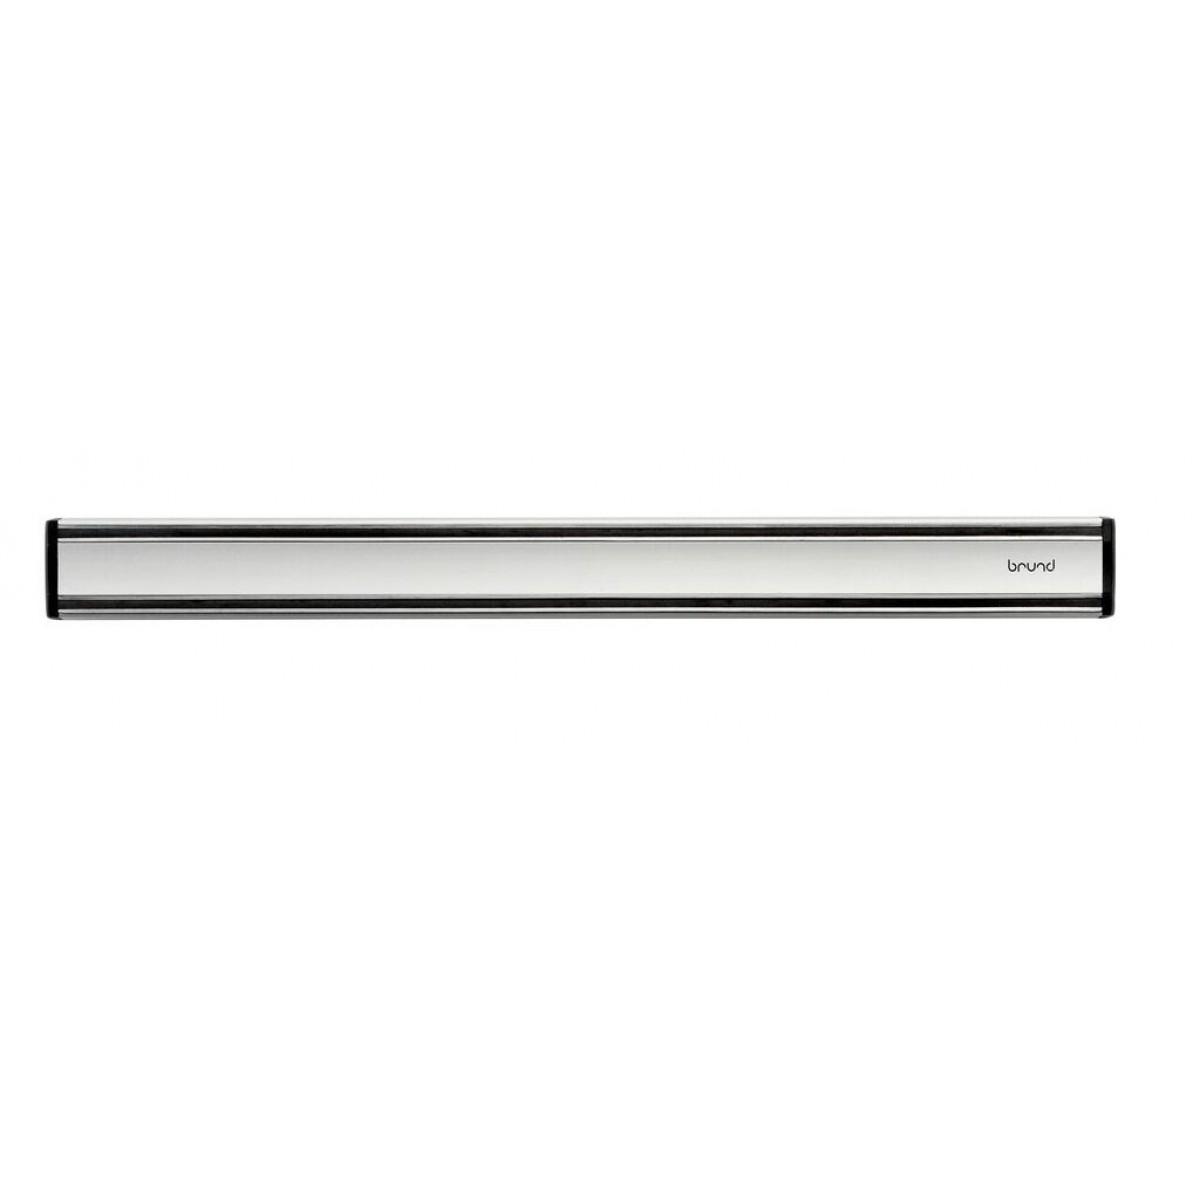 SCANPAN Brund knivmagnet 35 cm.